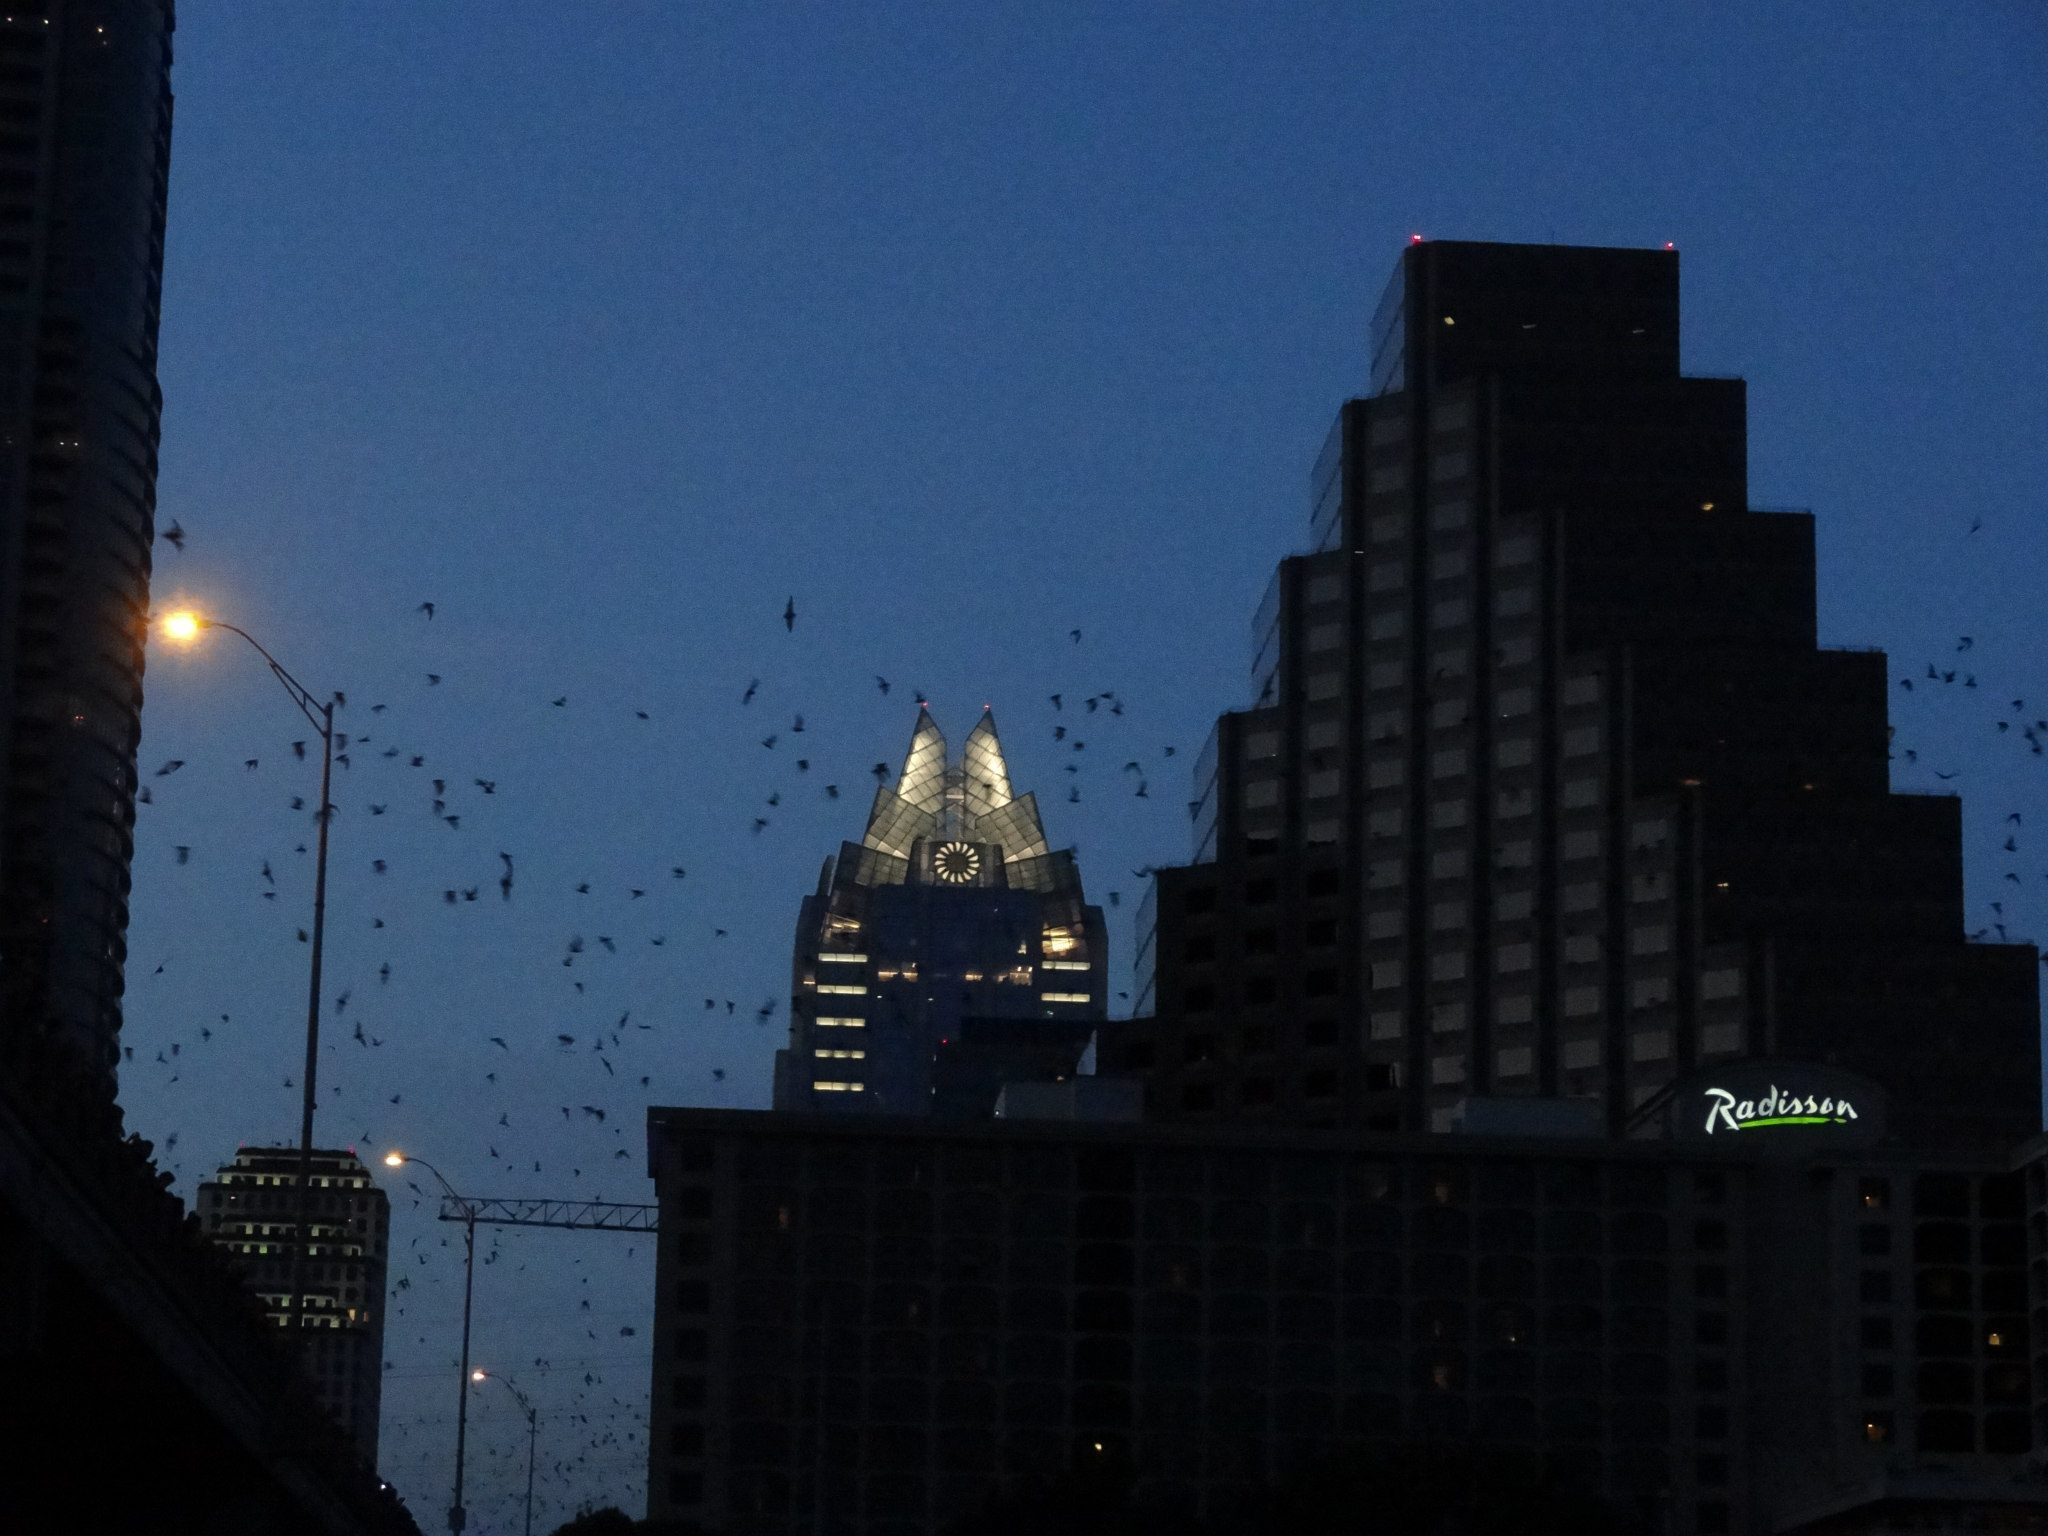 bats flying over South Congress bridge in Austin Texas